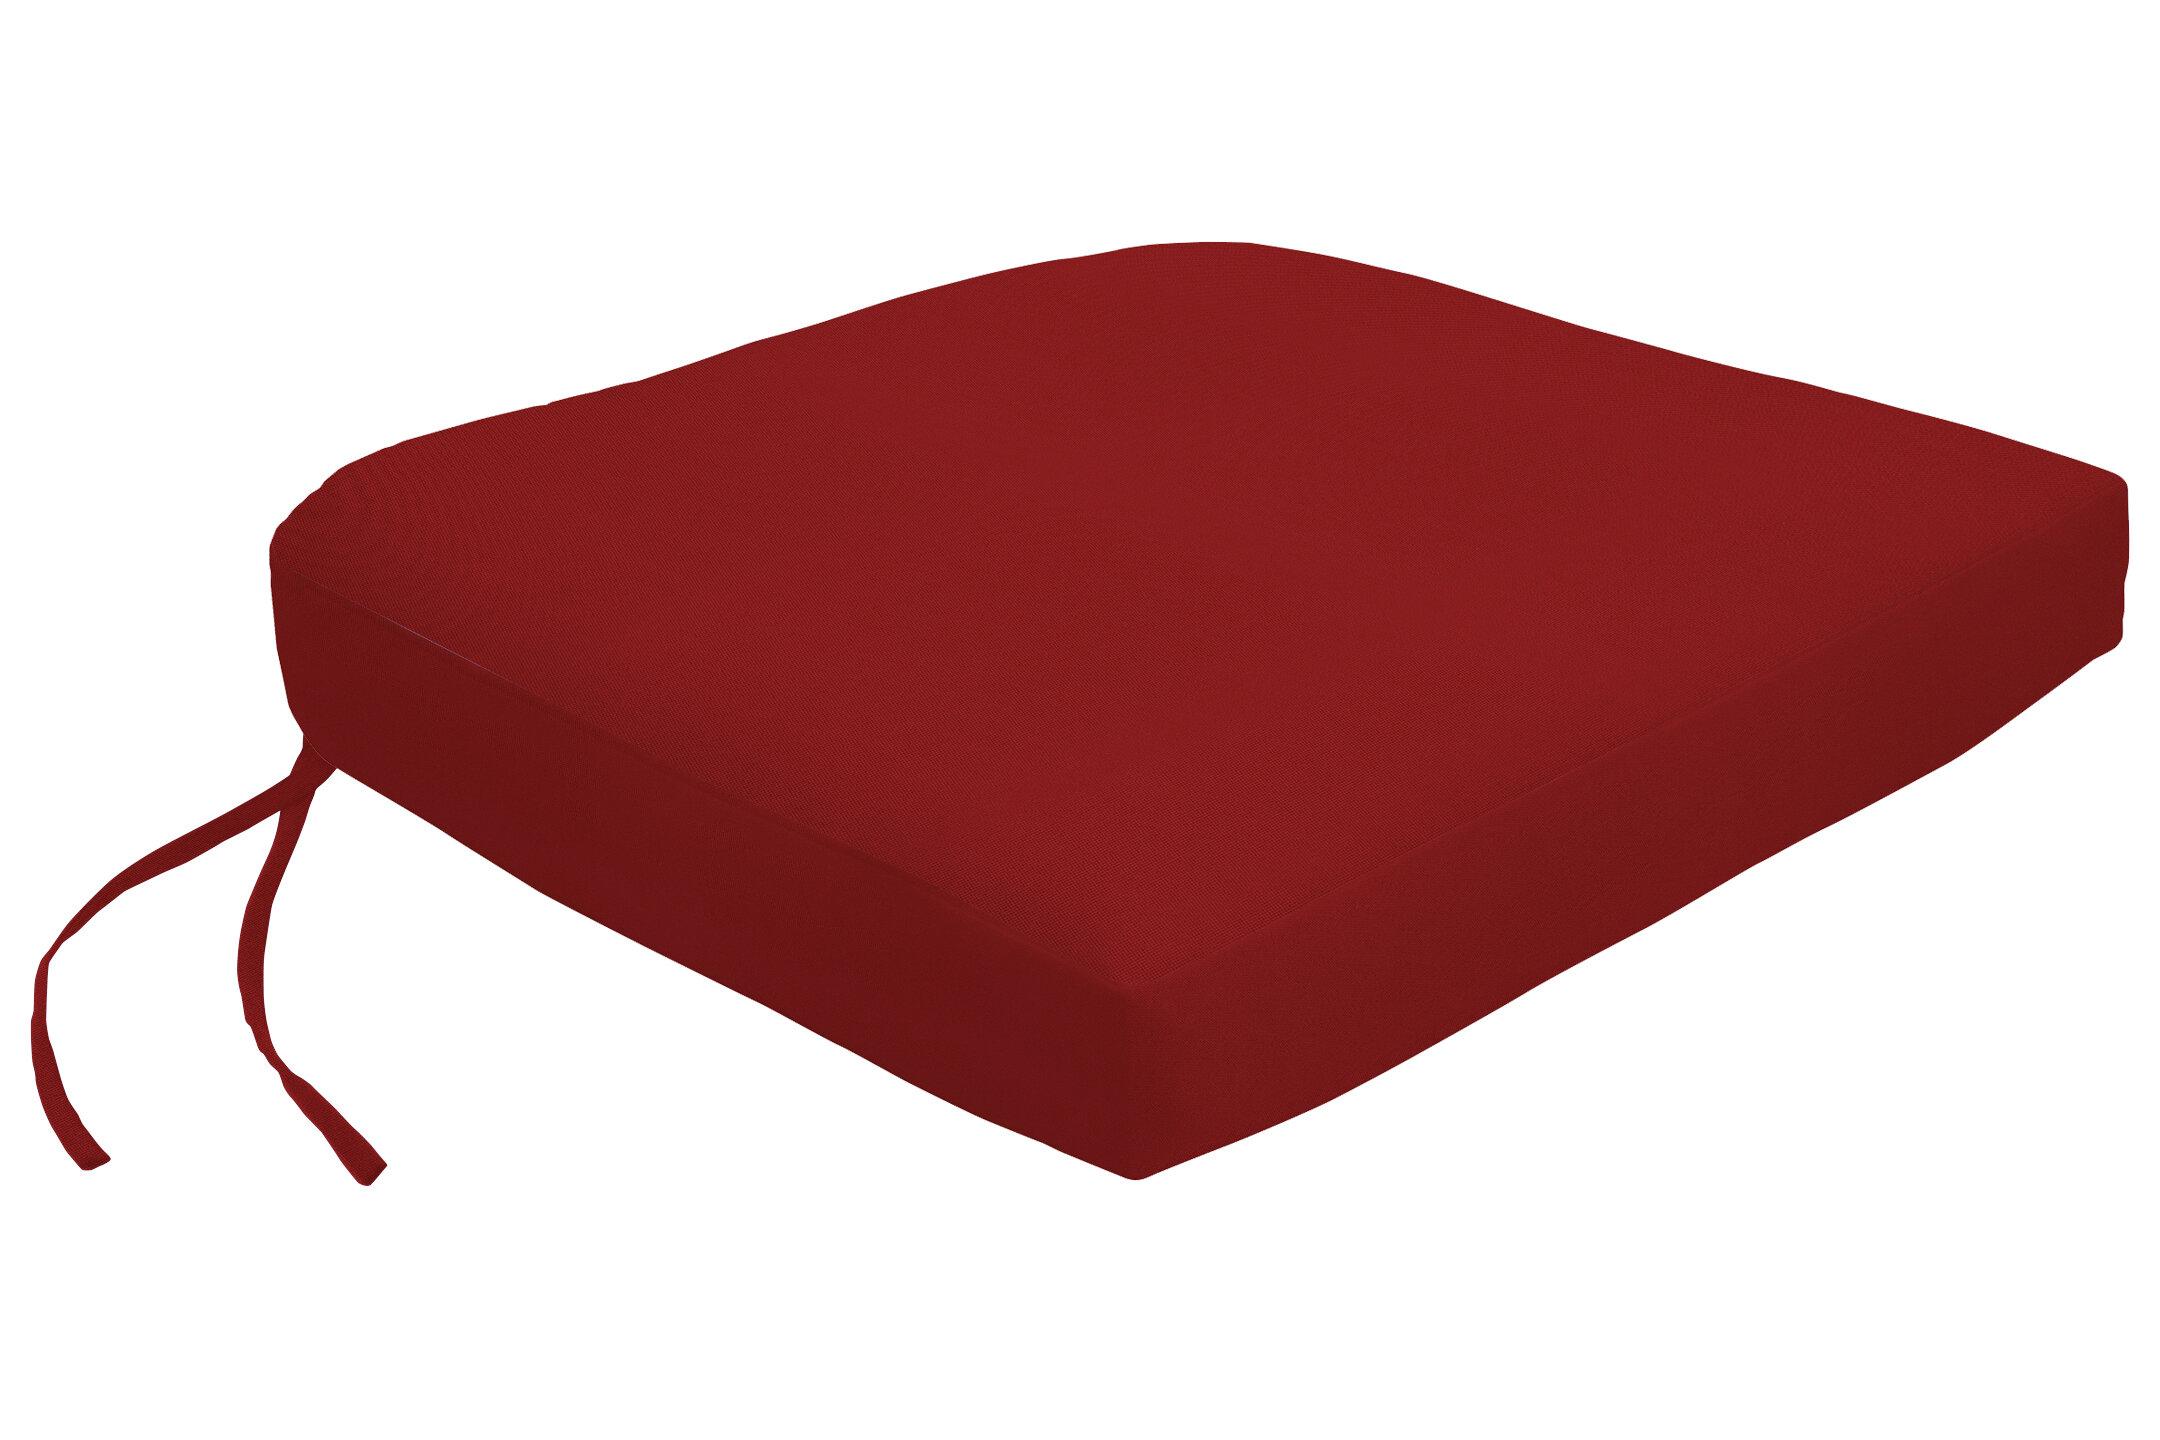 Wayfair Custom Outdoor Cushions Knife Edge Indoor/Outdoor Sunbrella Contour  Dining Chair Cushion With Ties U0026 Reviews | Wayfair